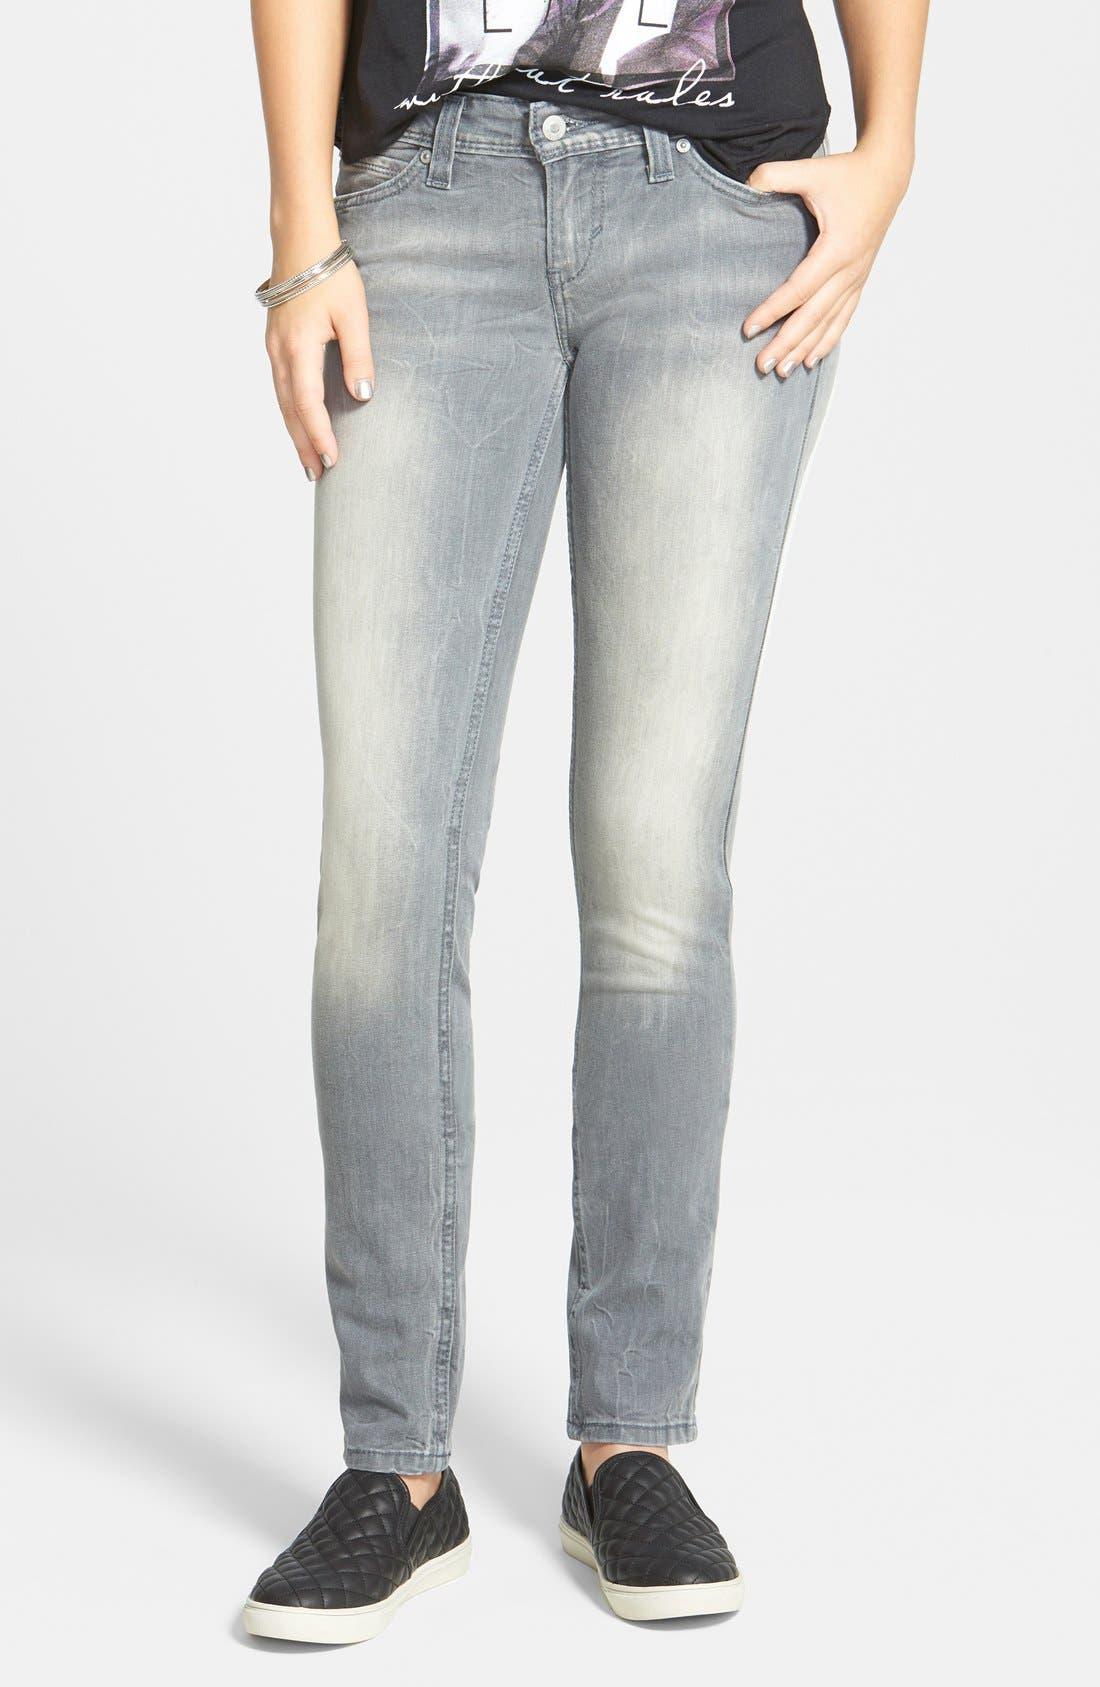 Alternate Image 1 Selected - Levi's® Demi Curve Jeans (Sunset Grey)